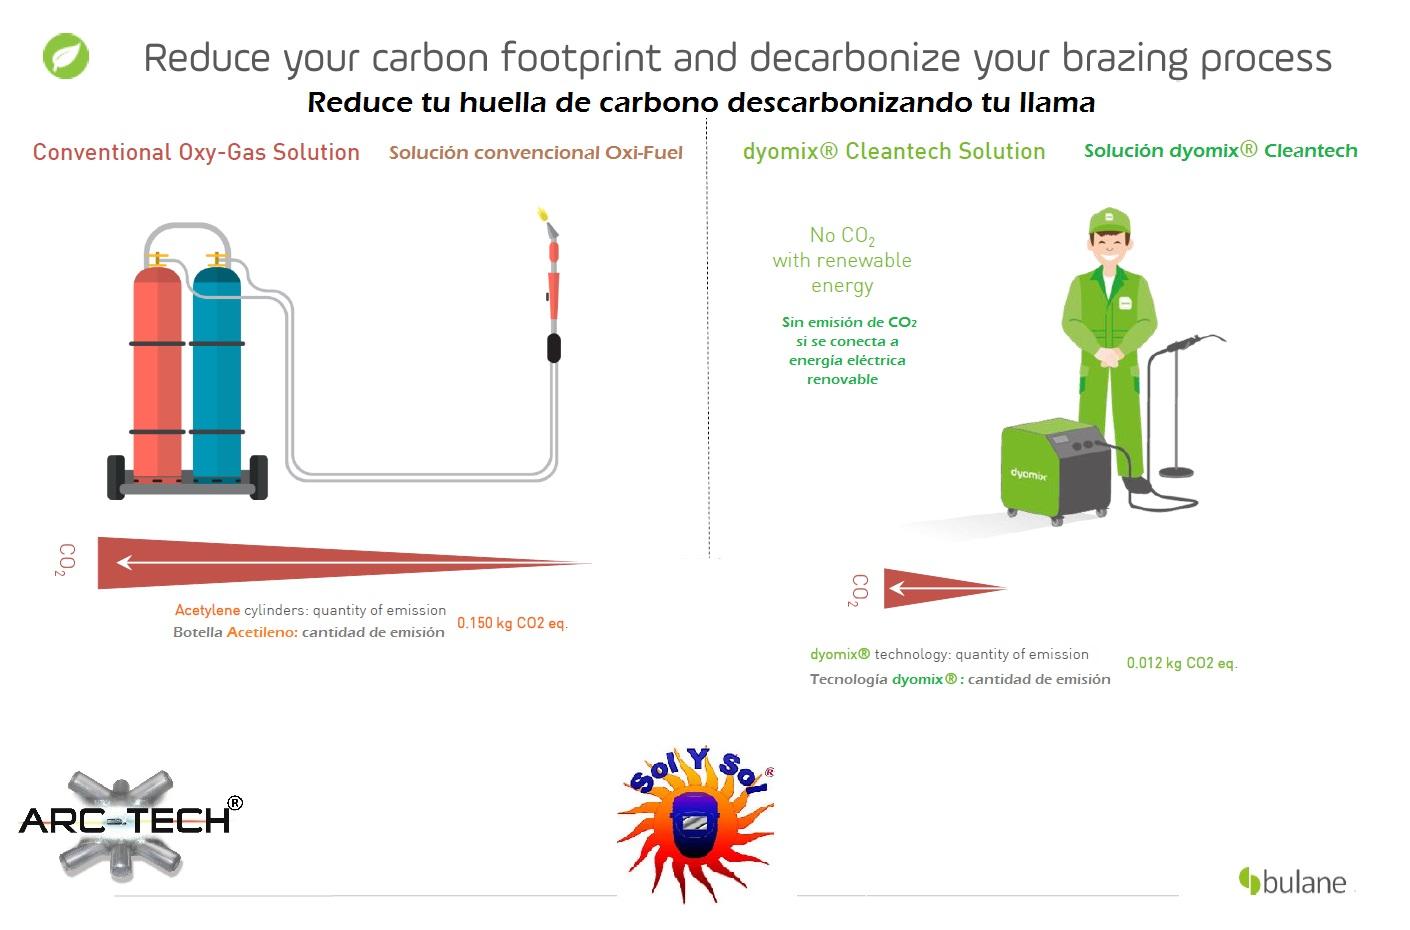 Emision CO2 llama oxifuel vs hidrogeno